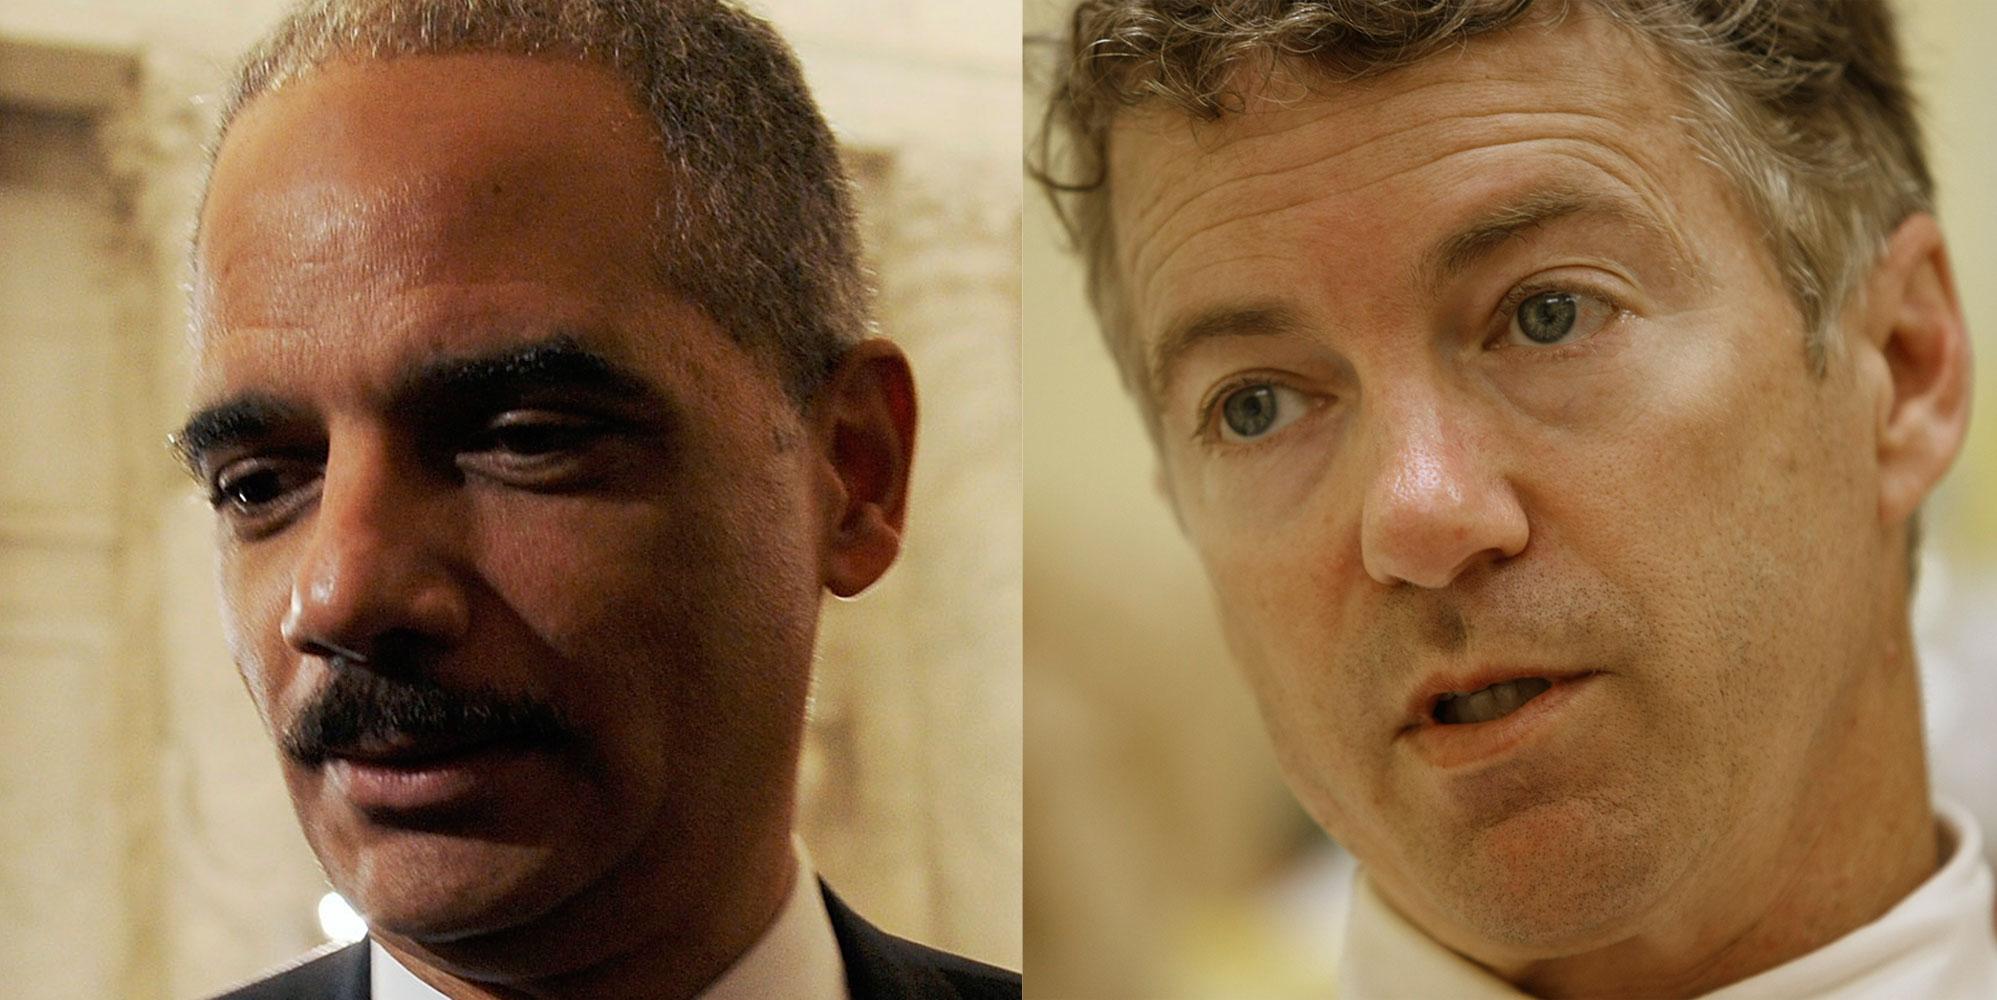 Attorney-General-Eric-Holder-ReutersJonathan-Ernst-and-Kentucky-Senator-Rand-Paul-AP-PhotoEd-Reinke